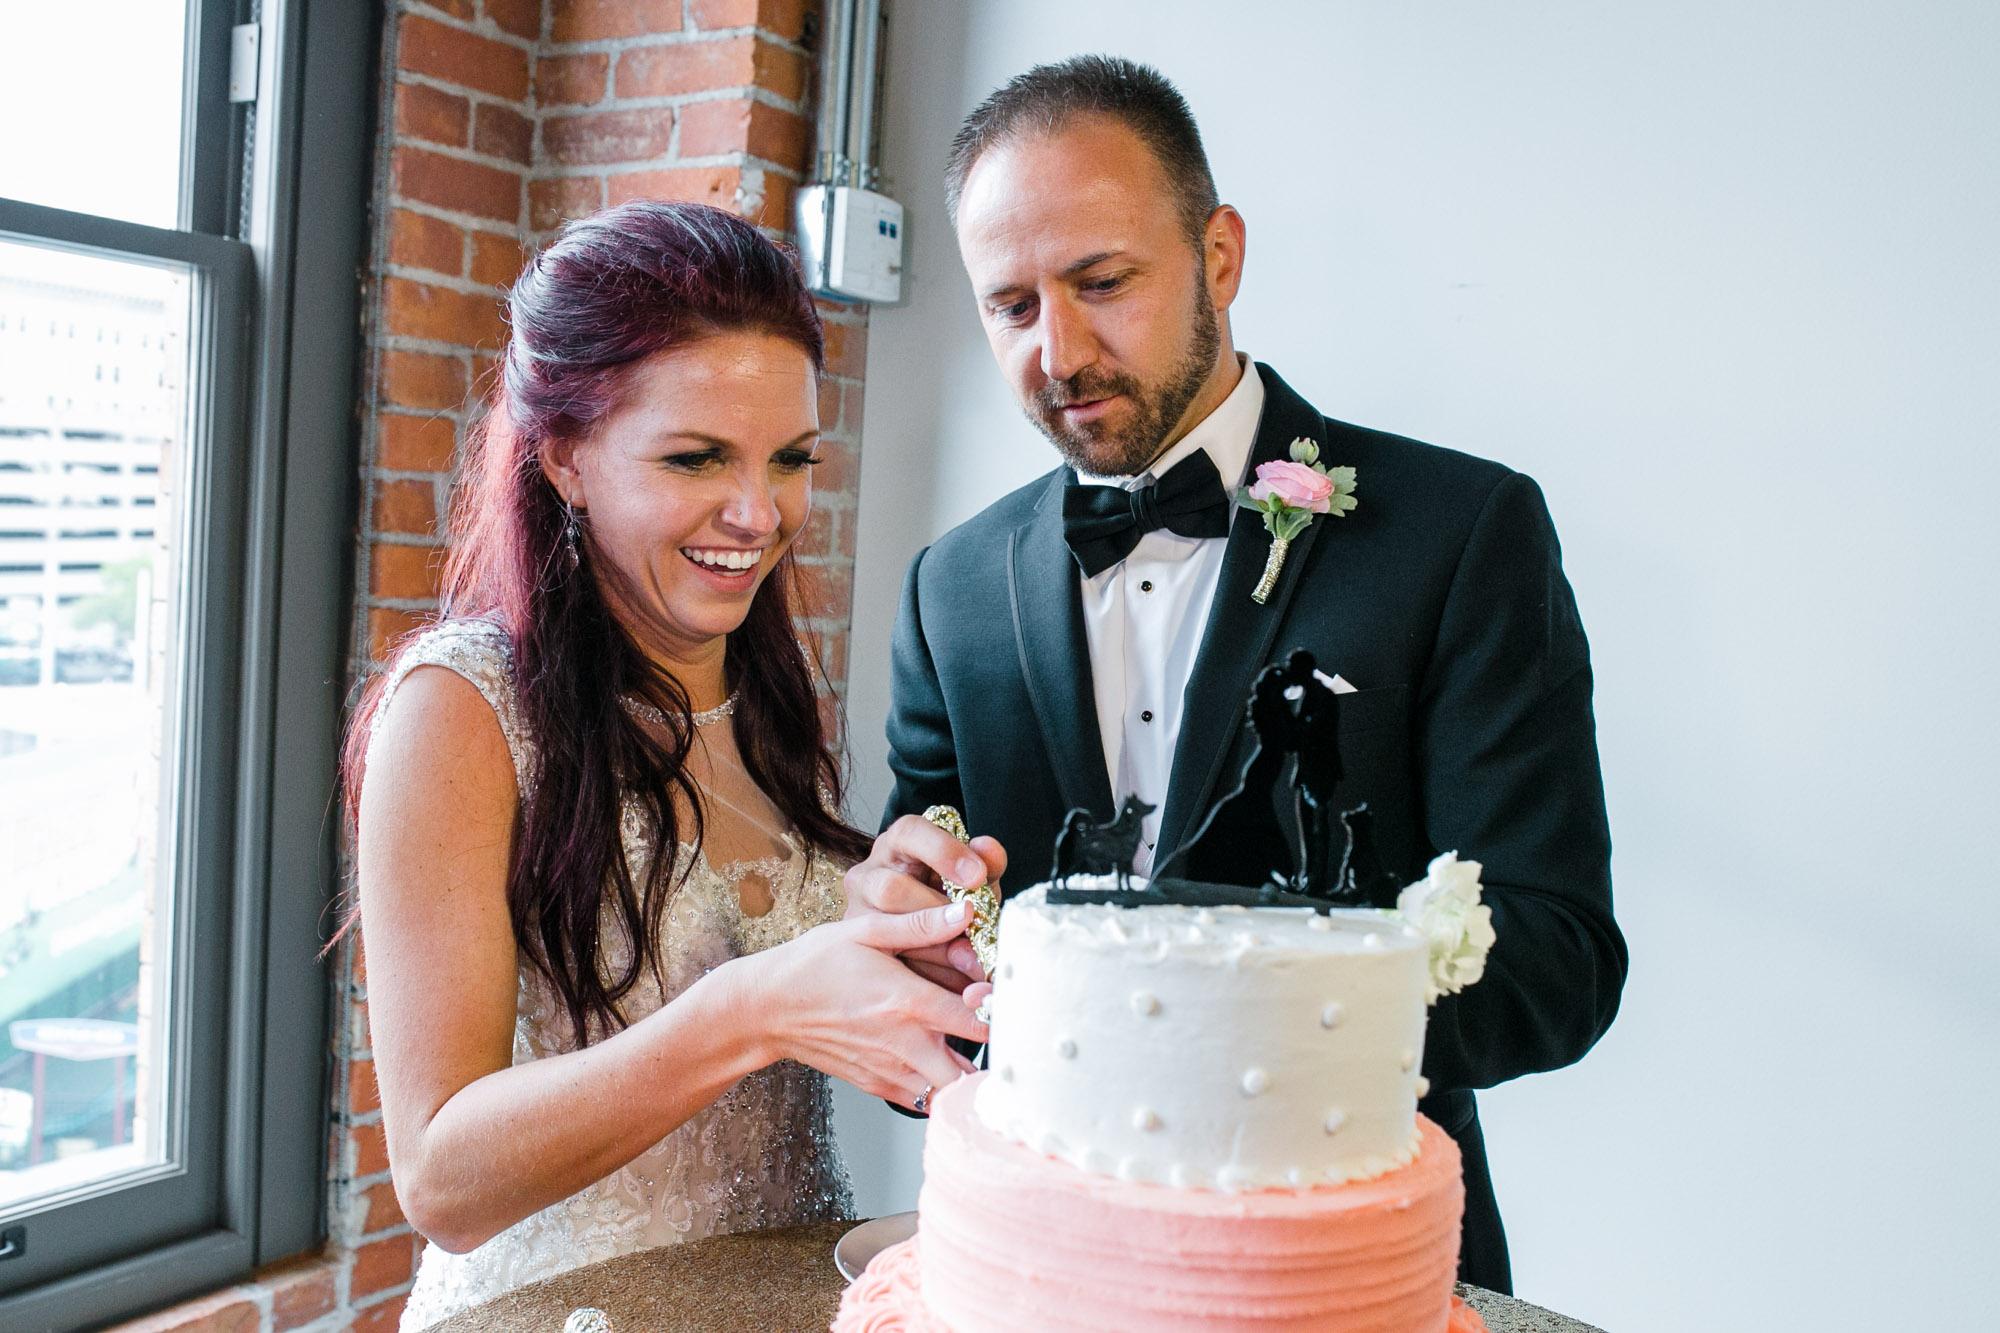 hensville-wedding-downtown-toledo-ohio (89 of 103).jpg